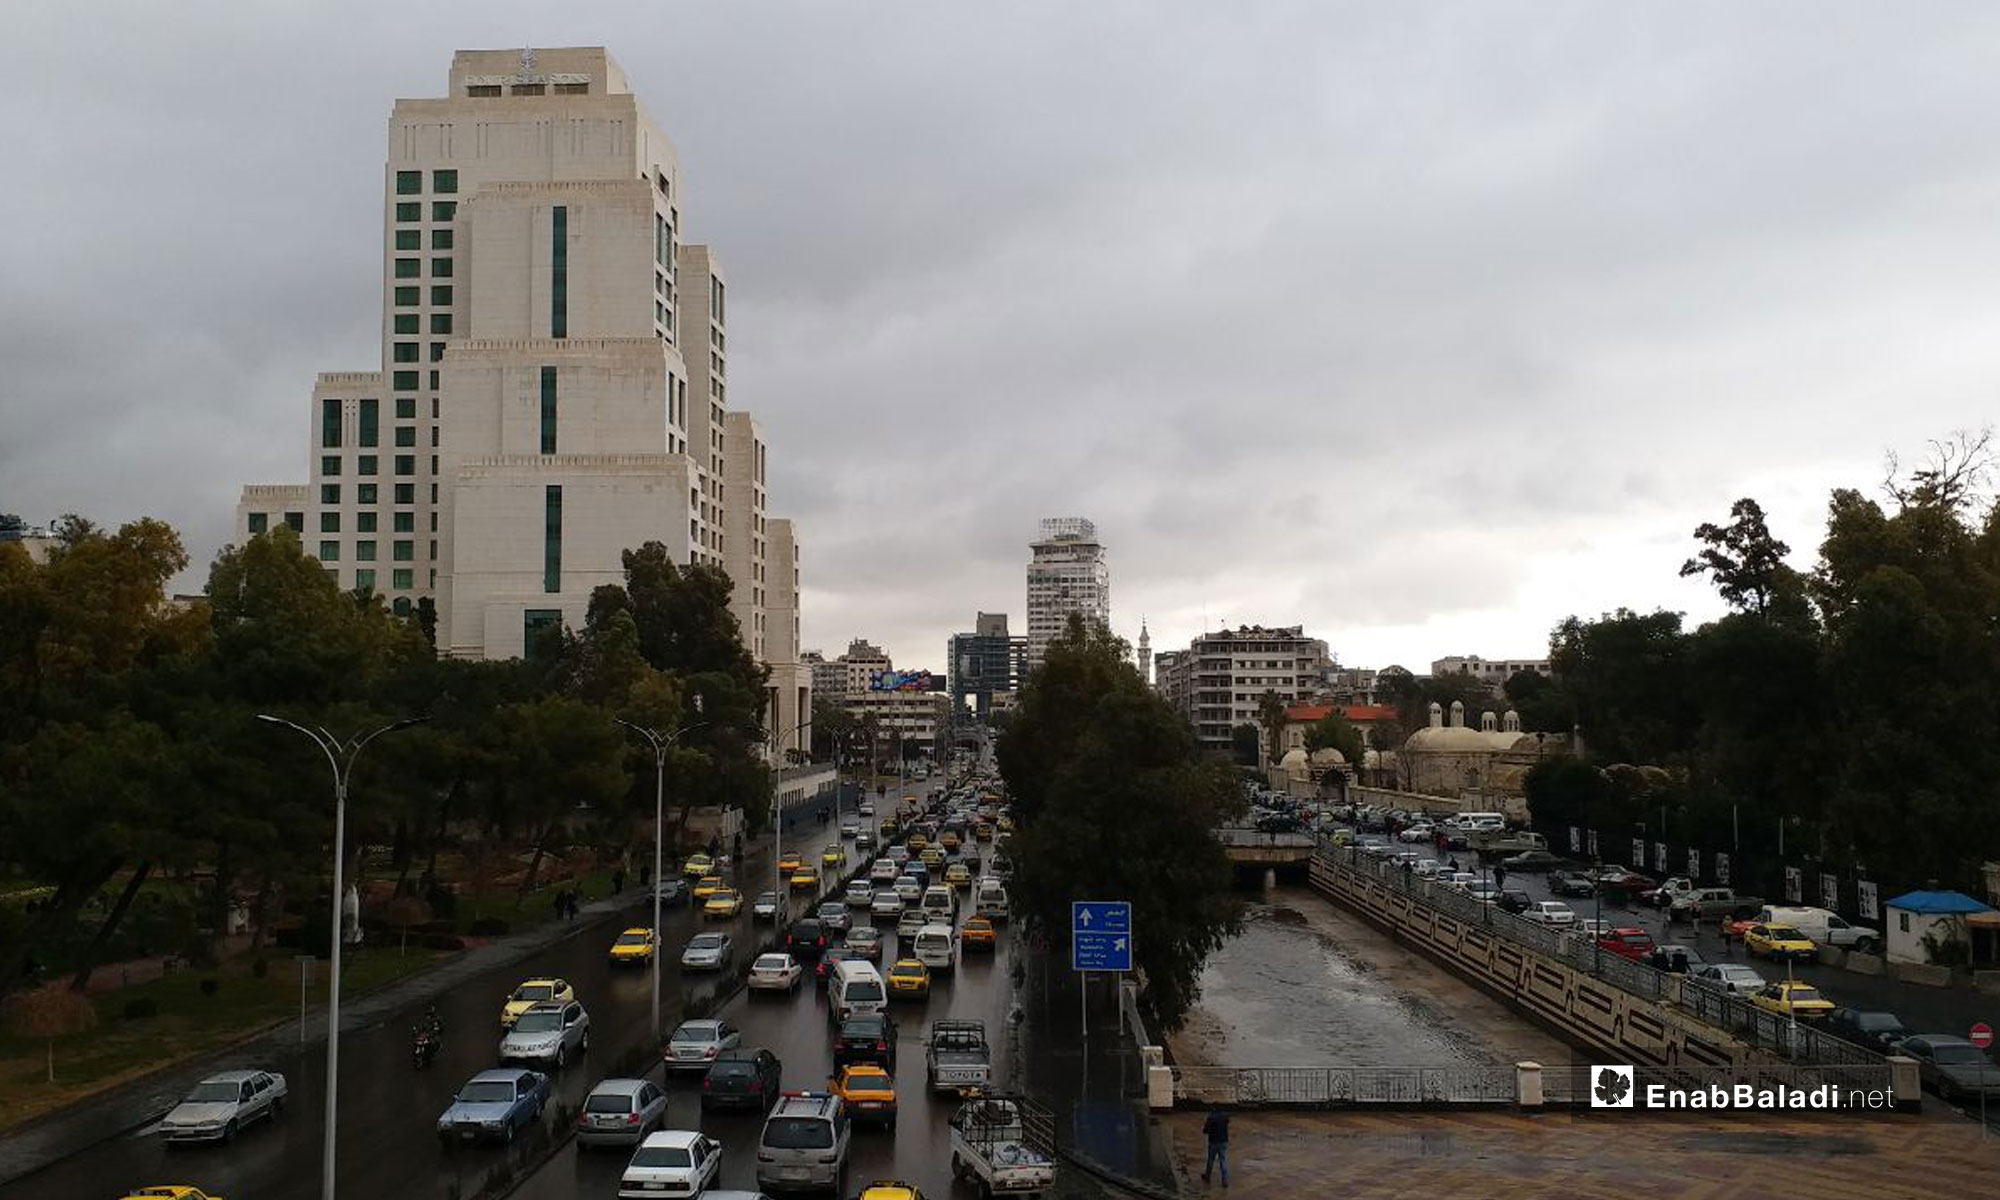 Jiser Al-Raees, Damascus - January 12, 2019 (Enab Baladi)